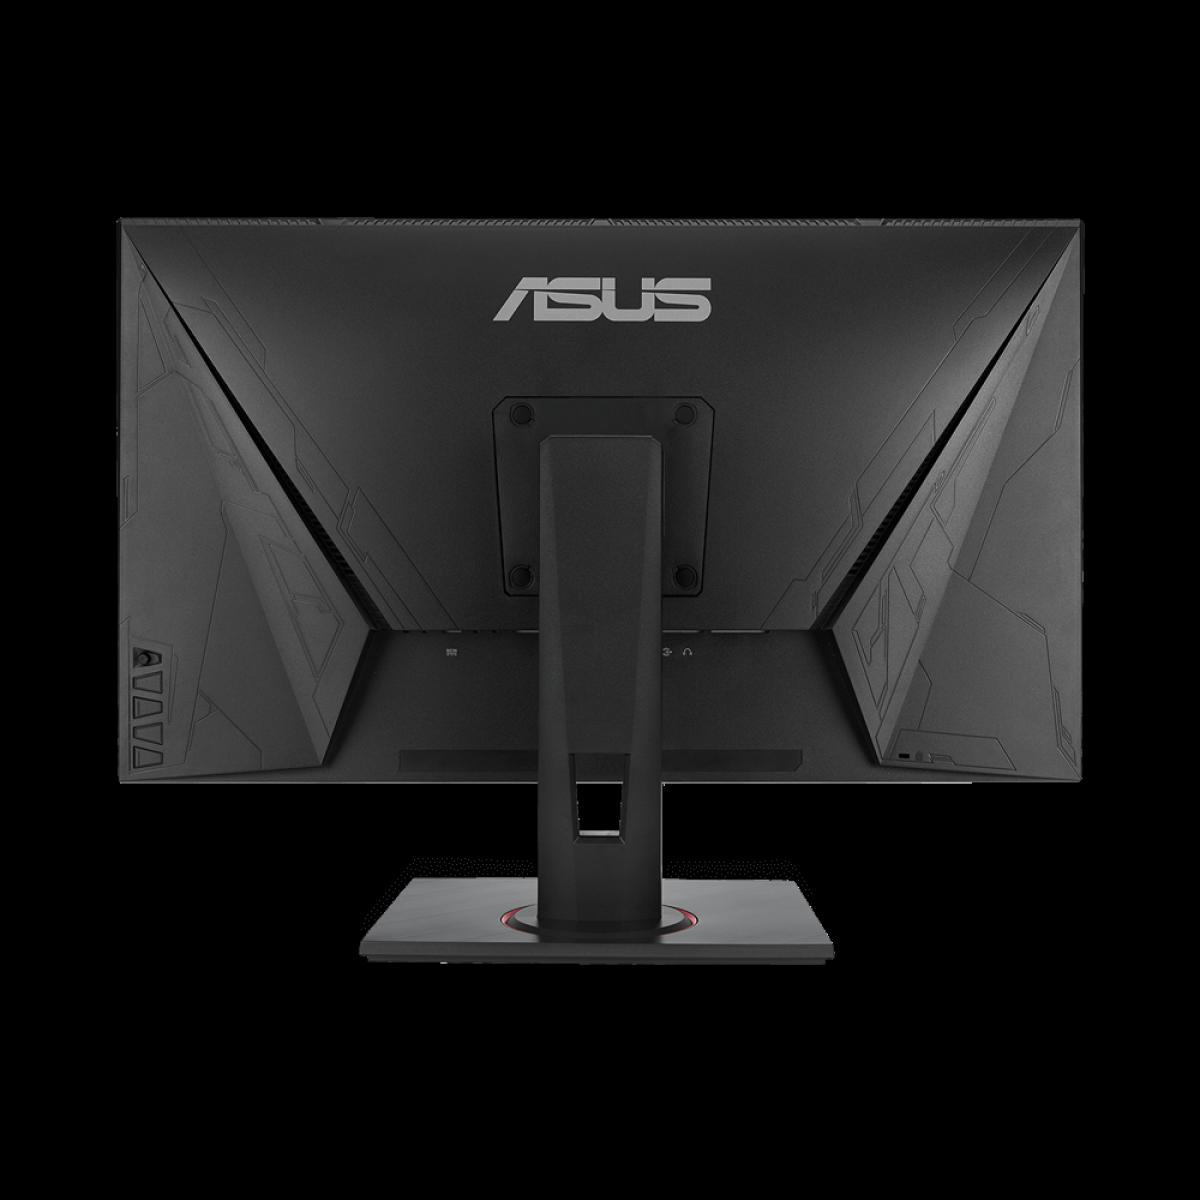 Monitor Gamer ASUS 27 Pol, Full HD, 165Hz, 0,5ms, HDMI/DP/DVI, VG278QR